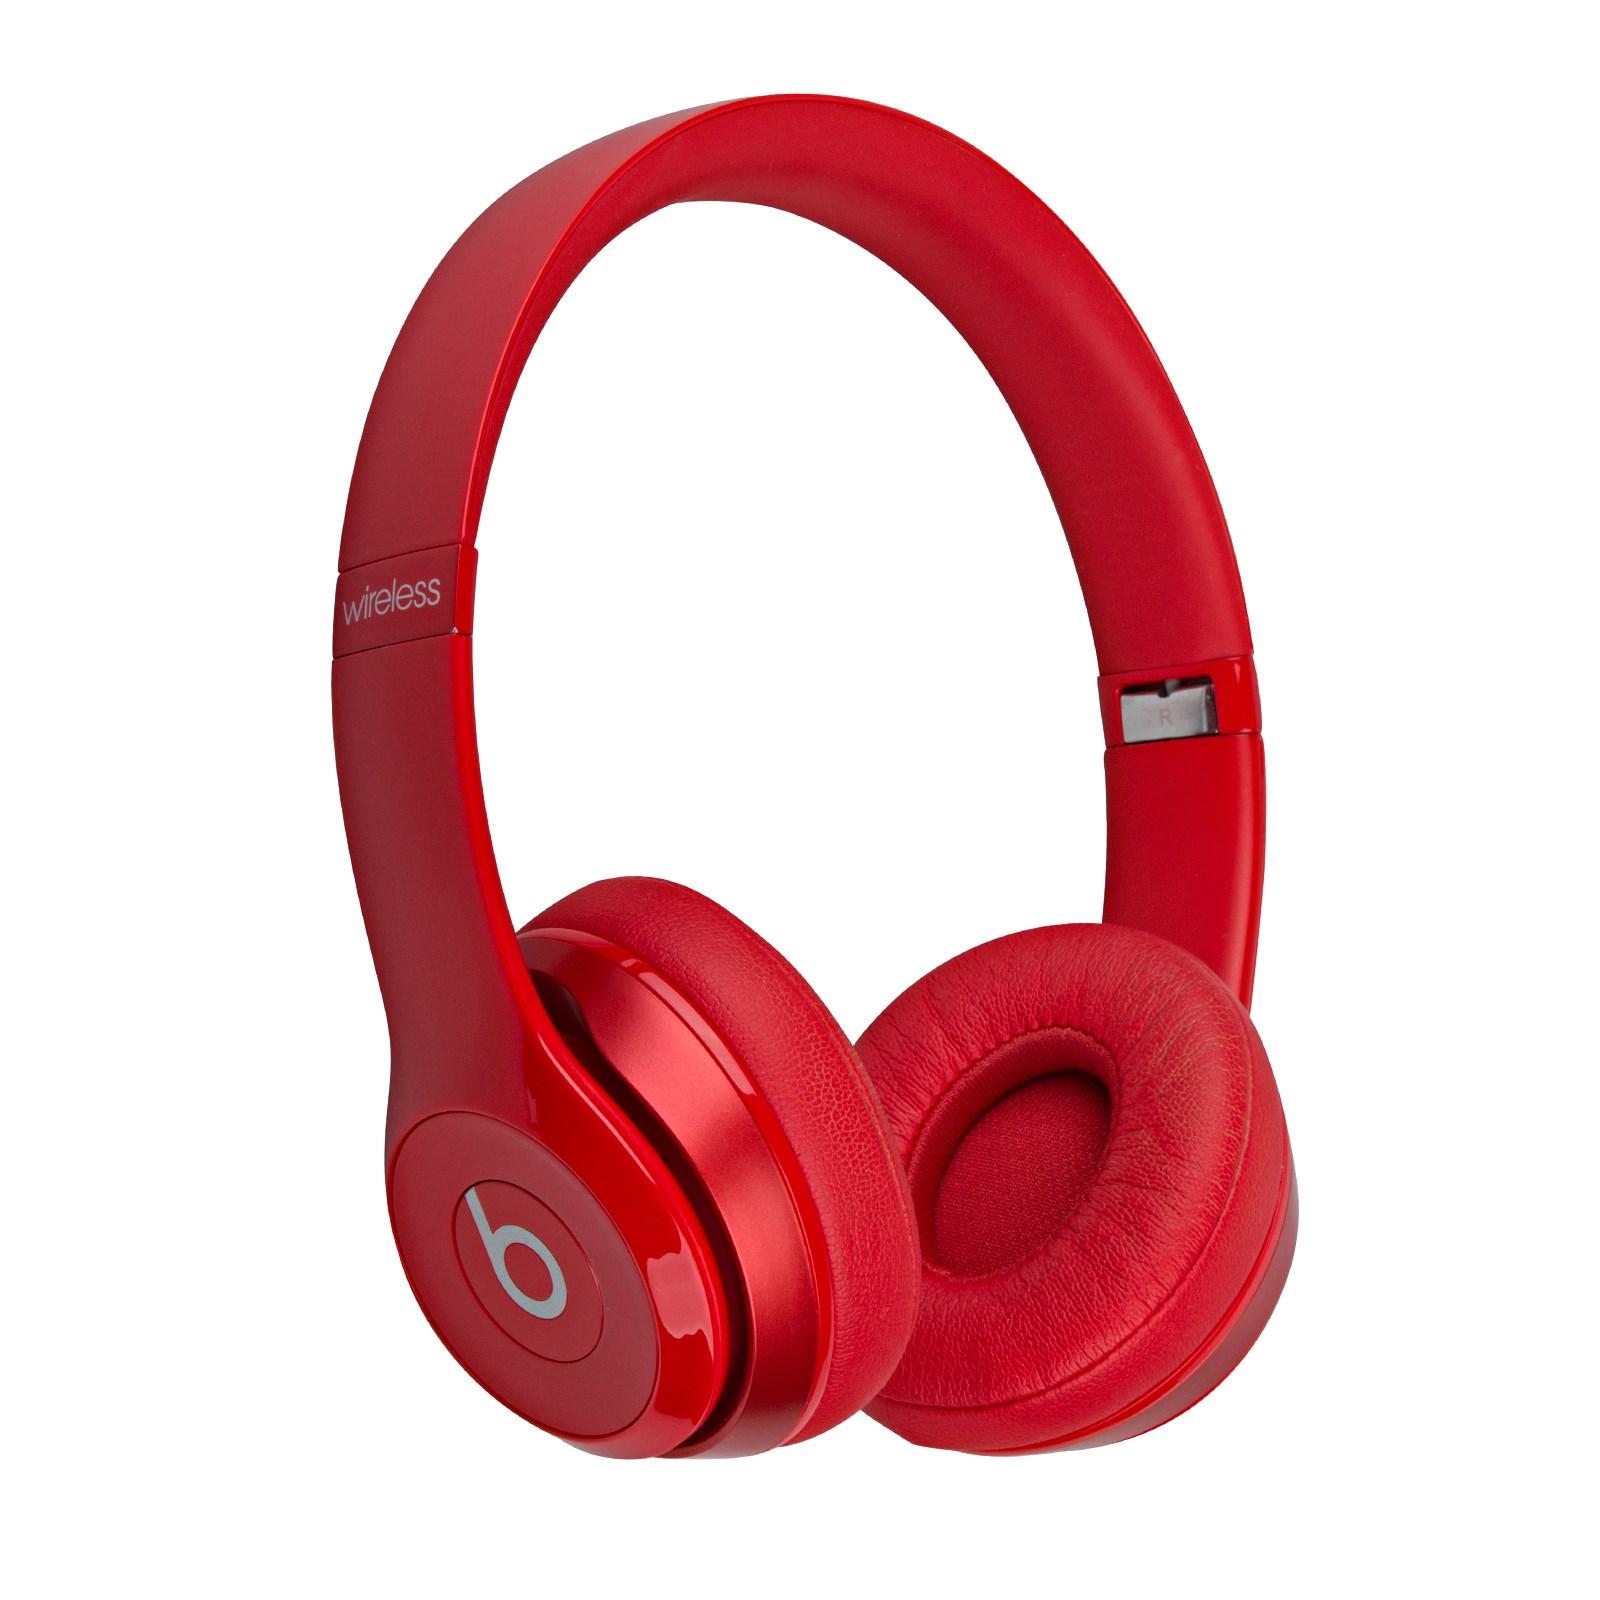 Beats headphones wireless blue - beats bluetooth headphones wireless